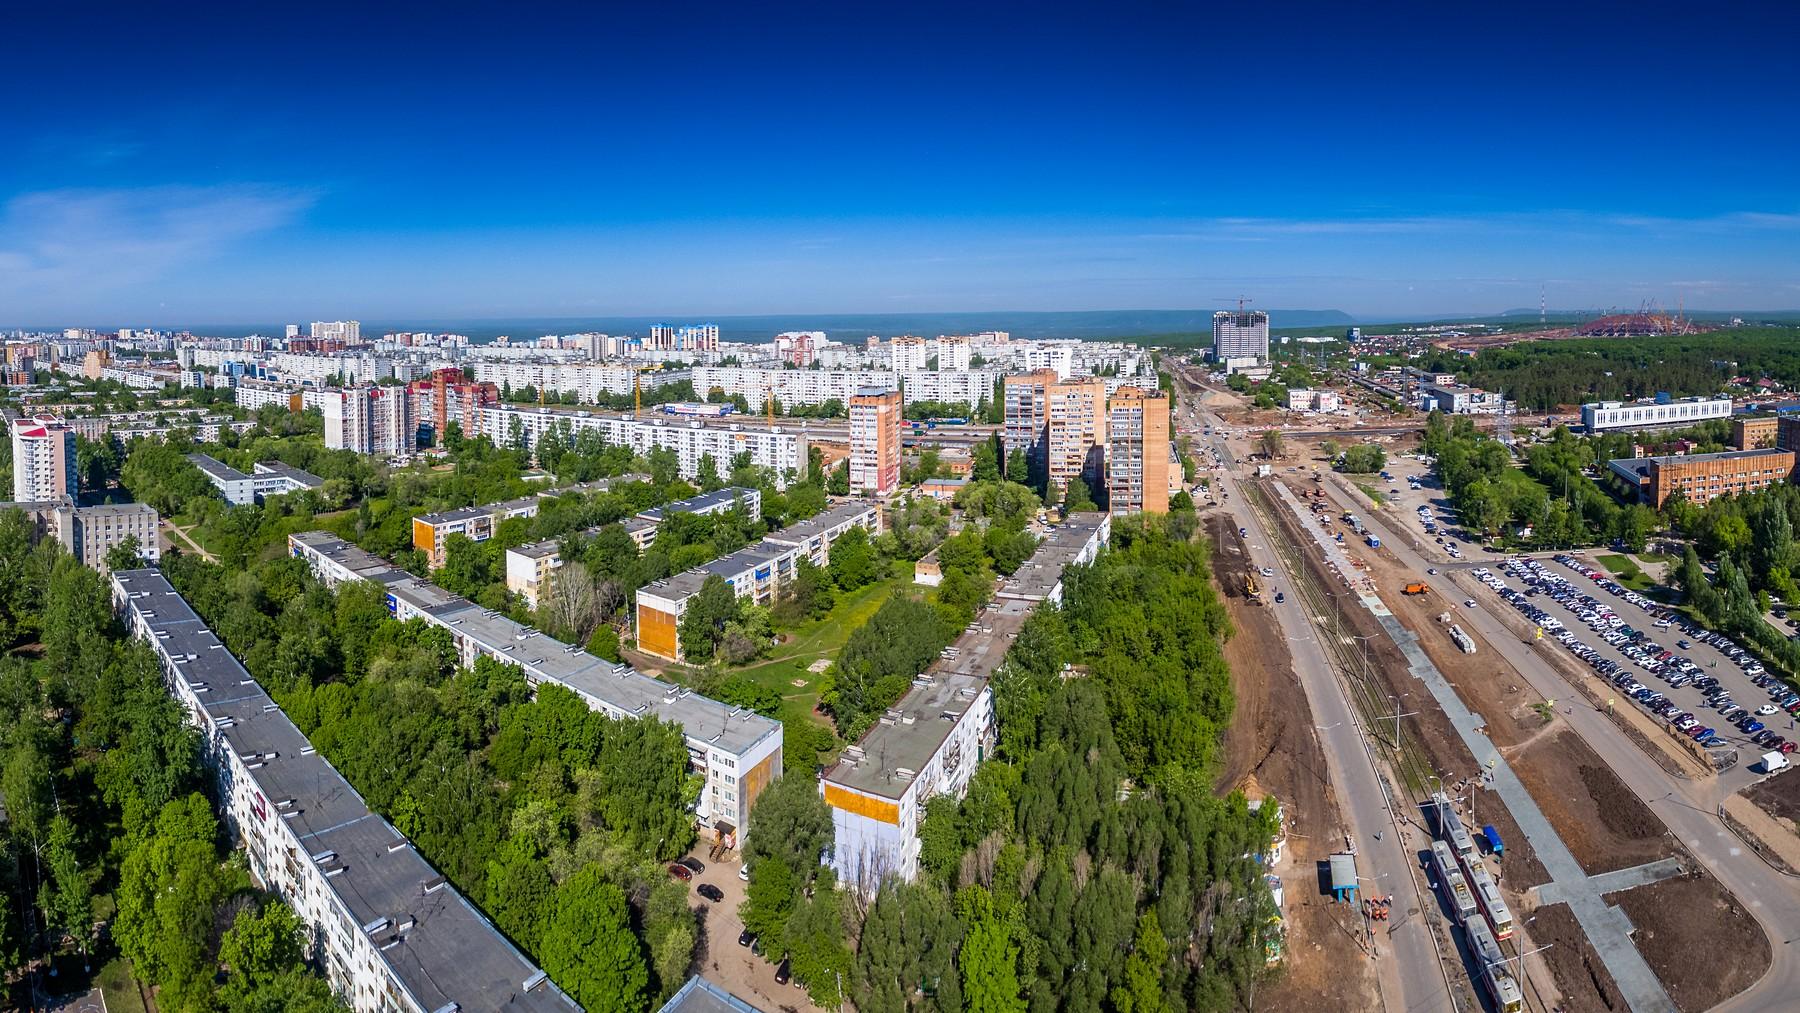 кировский район самара картинки